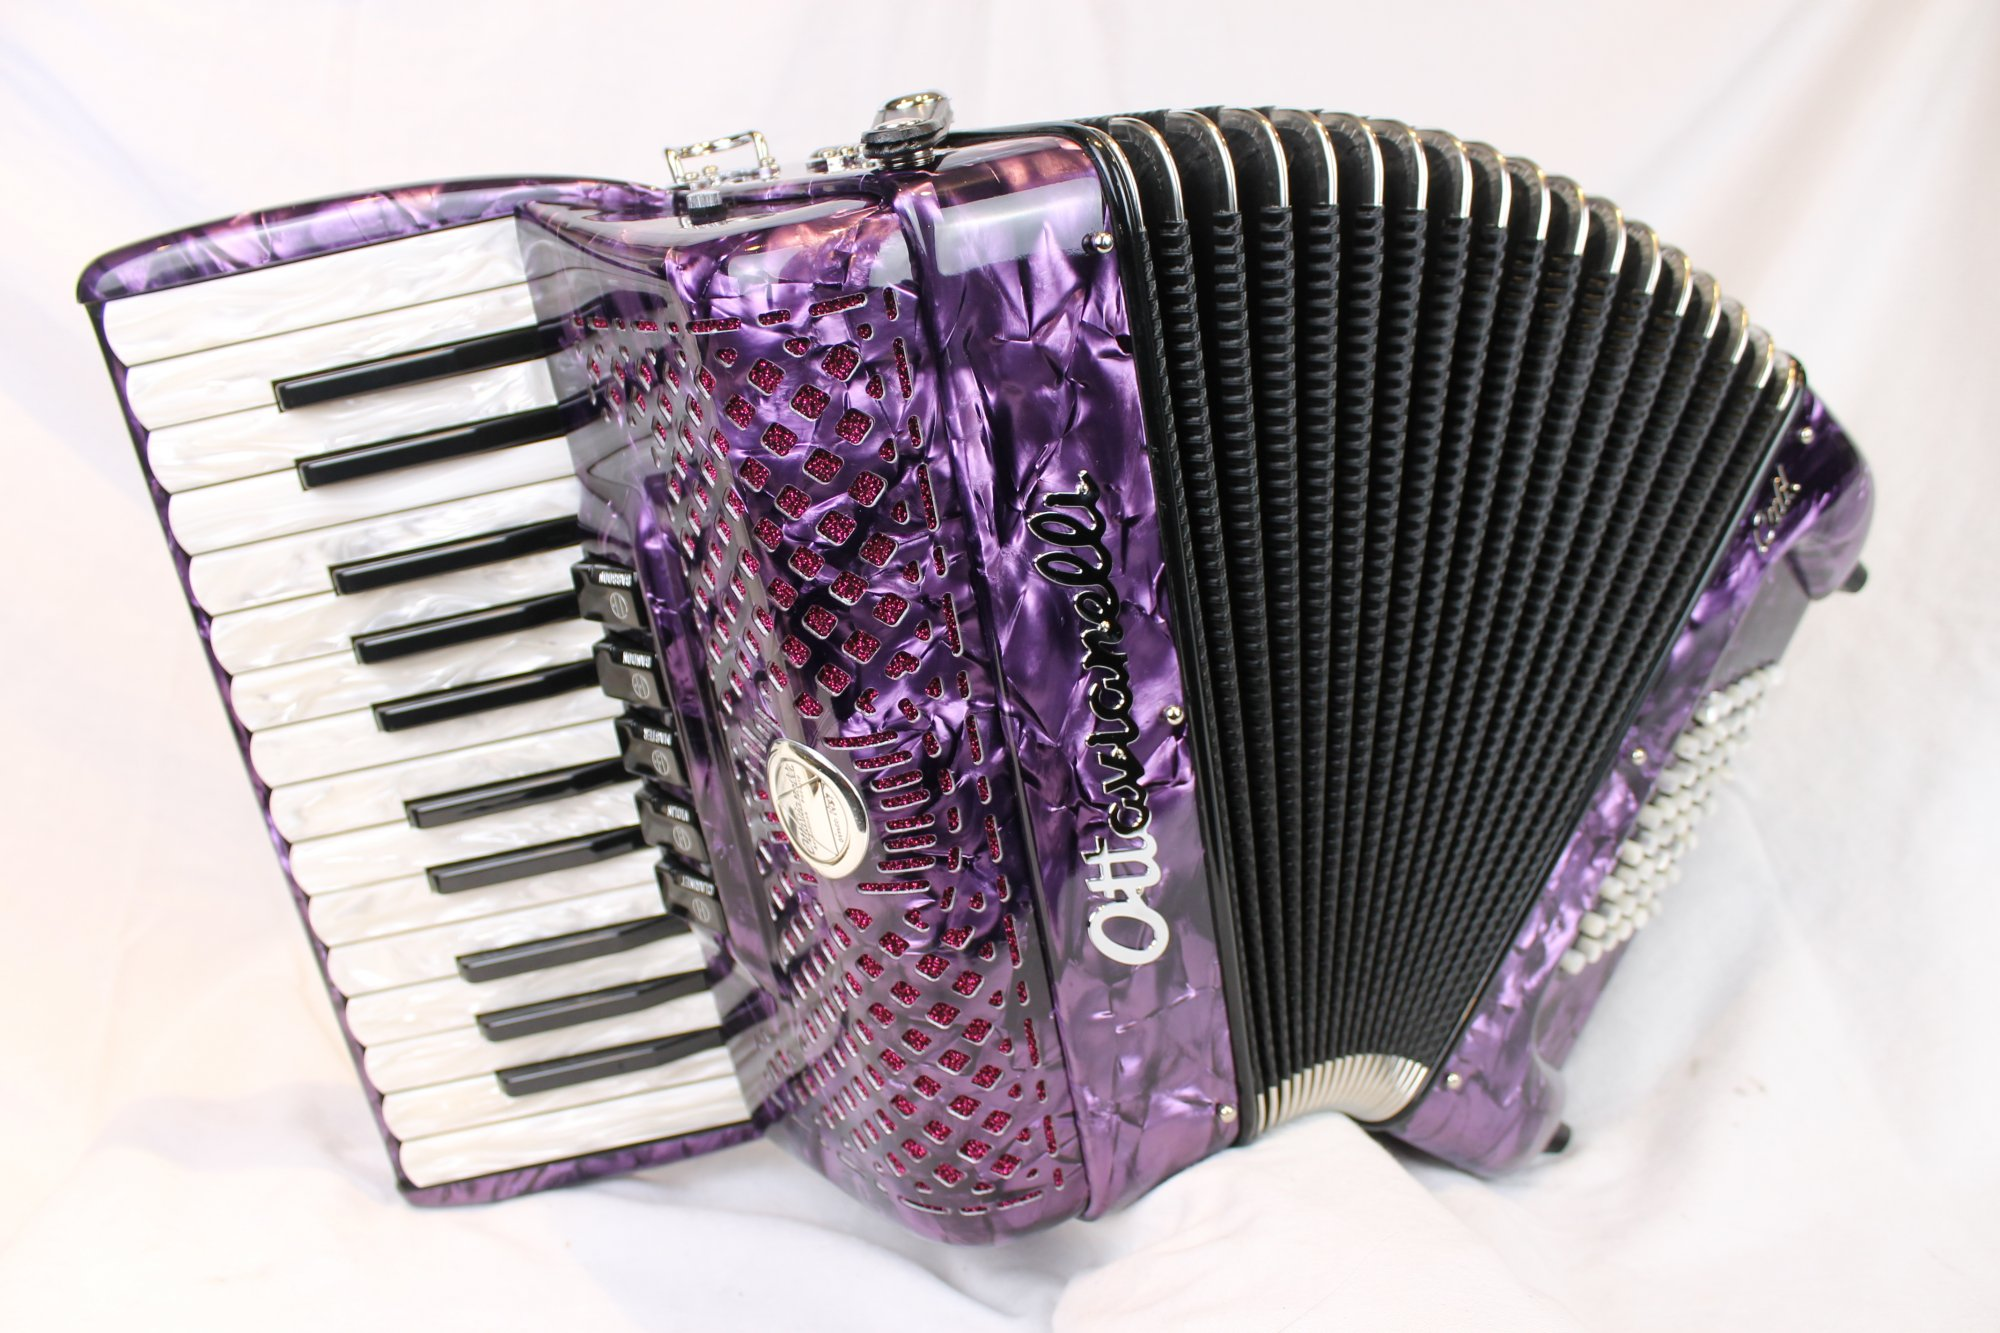 NEW Violet Ottavianelli Cub I Piano Accordion LMM 26 48